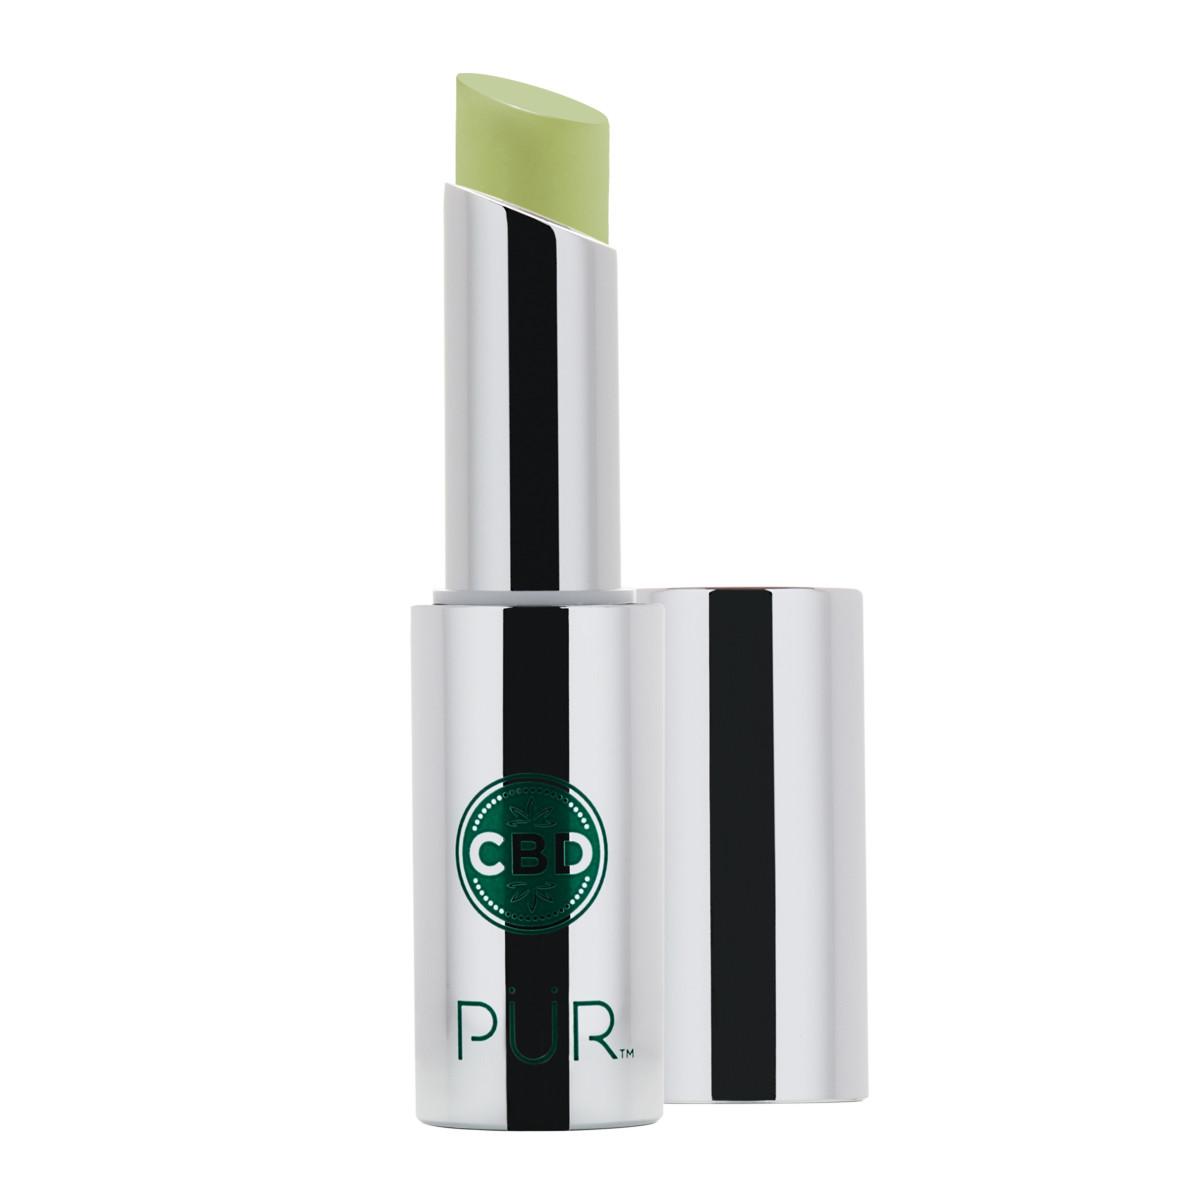 Hybrid Balm CBD Hydrating Tinted Lip Balm in Mellow (Clear)